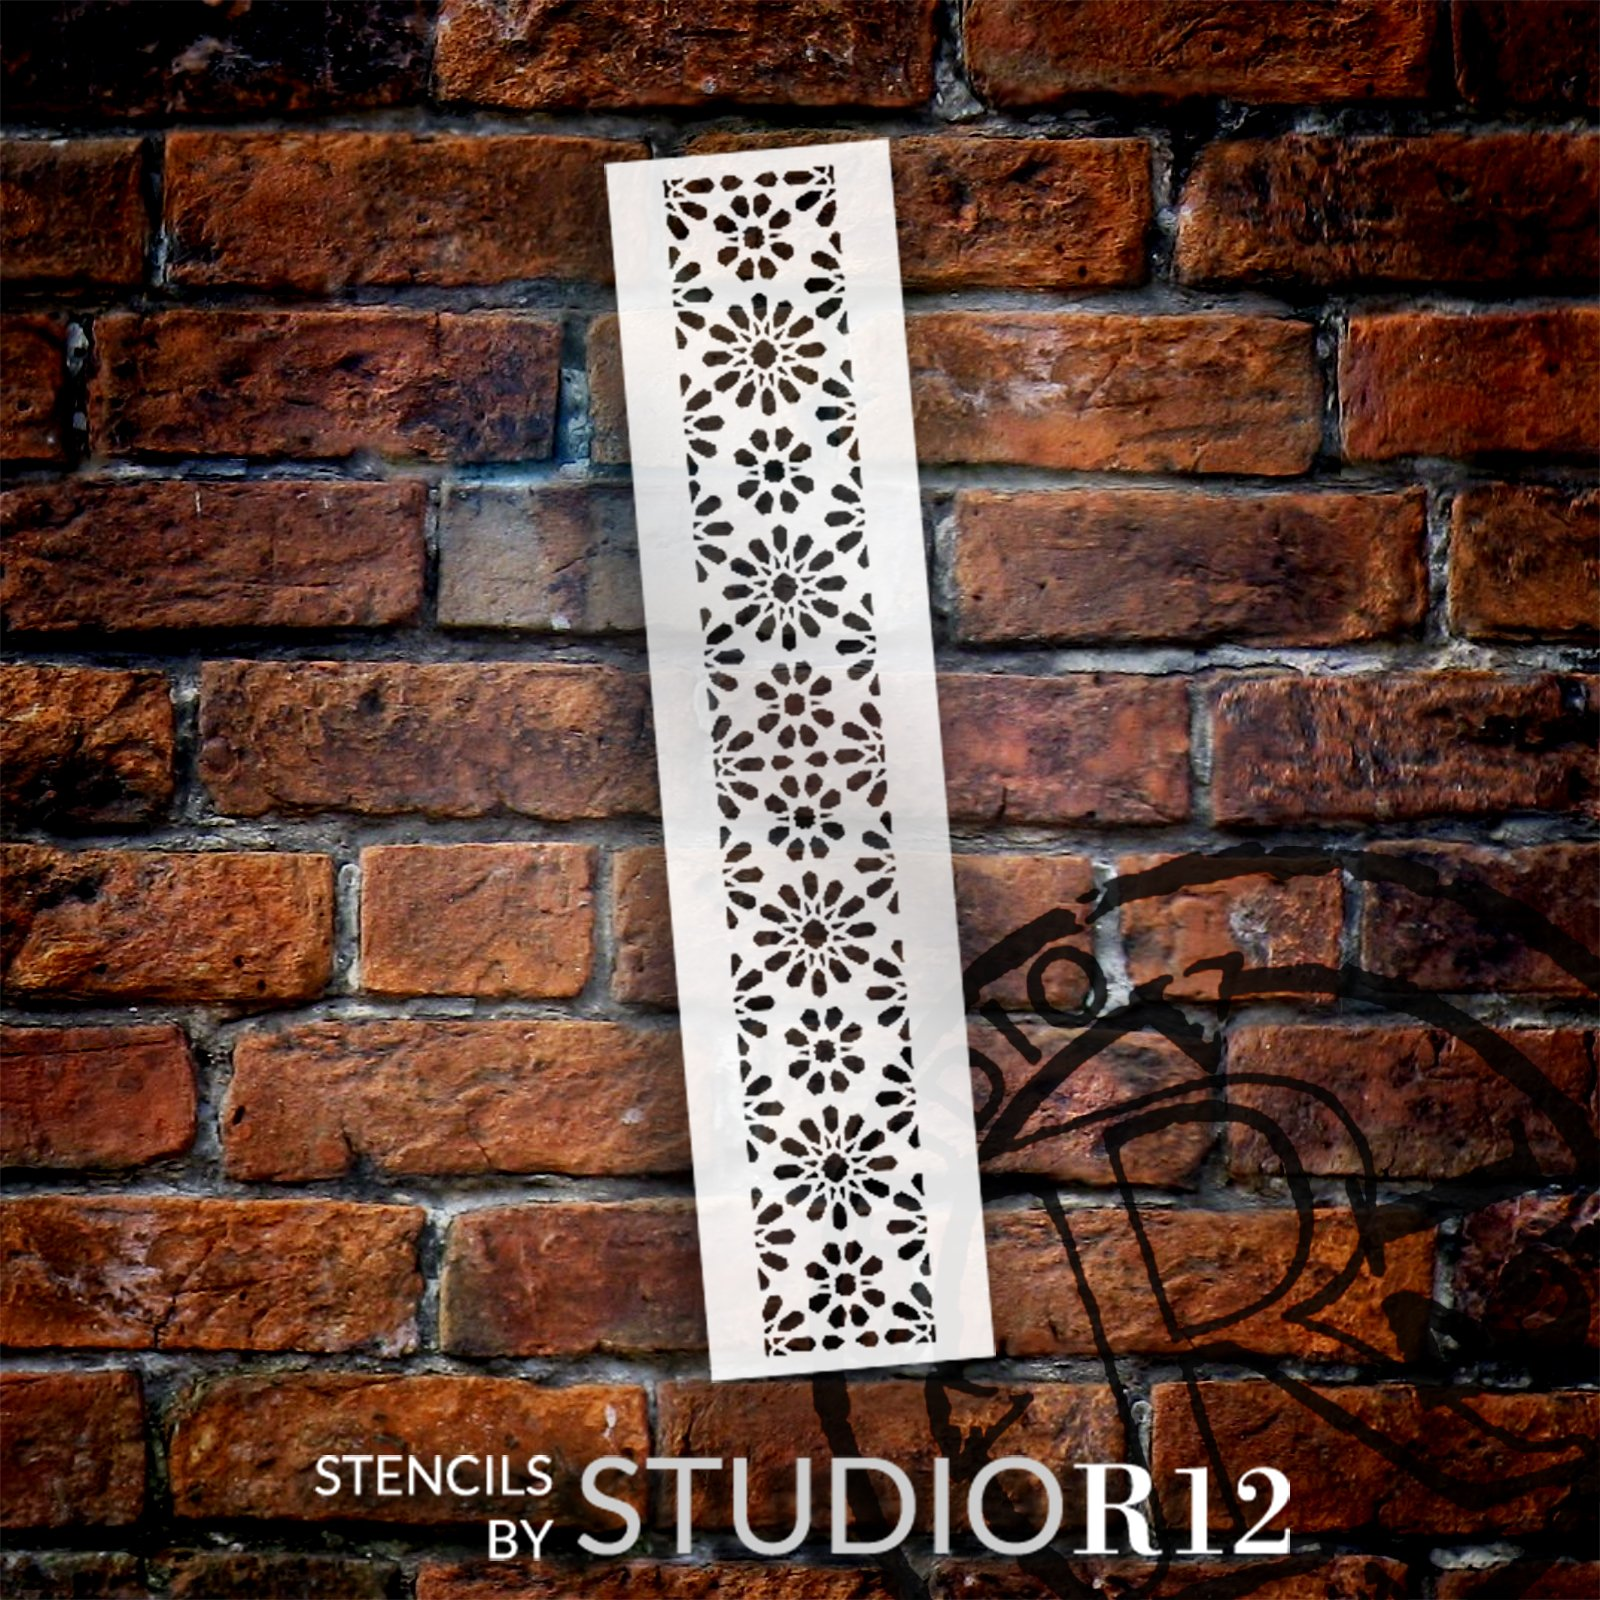 Moresque Mosaic Starburst Band Stencil by StudioR12 | DIY Flower Pattern Backsplash Home Decor | Craft & Paint Wood Sign Border | Select Size